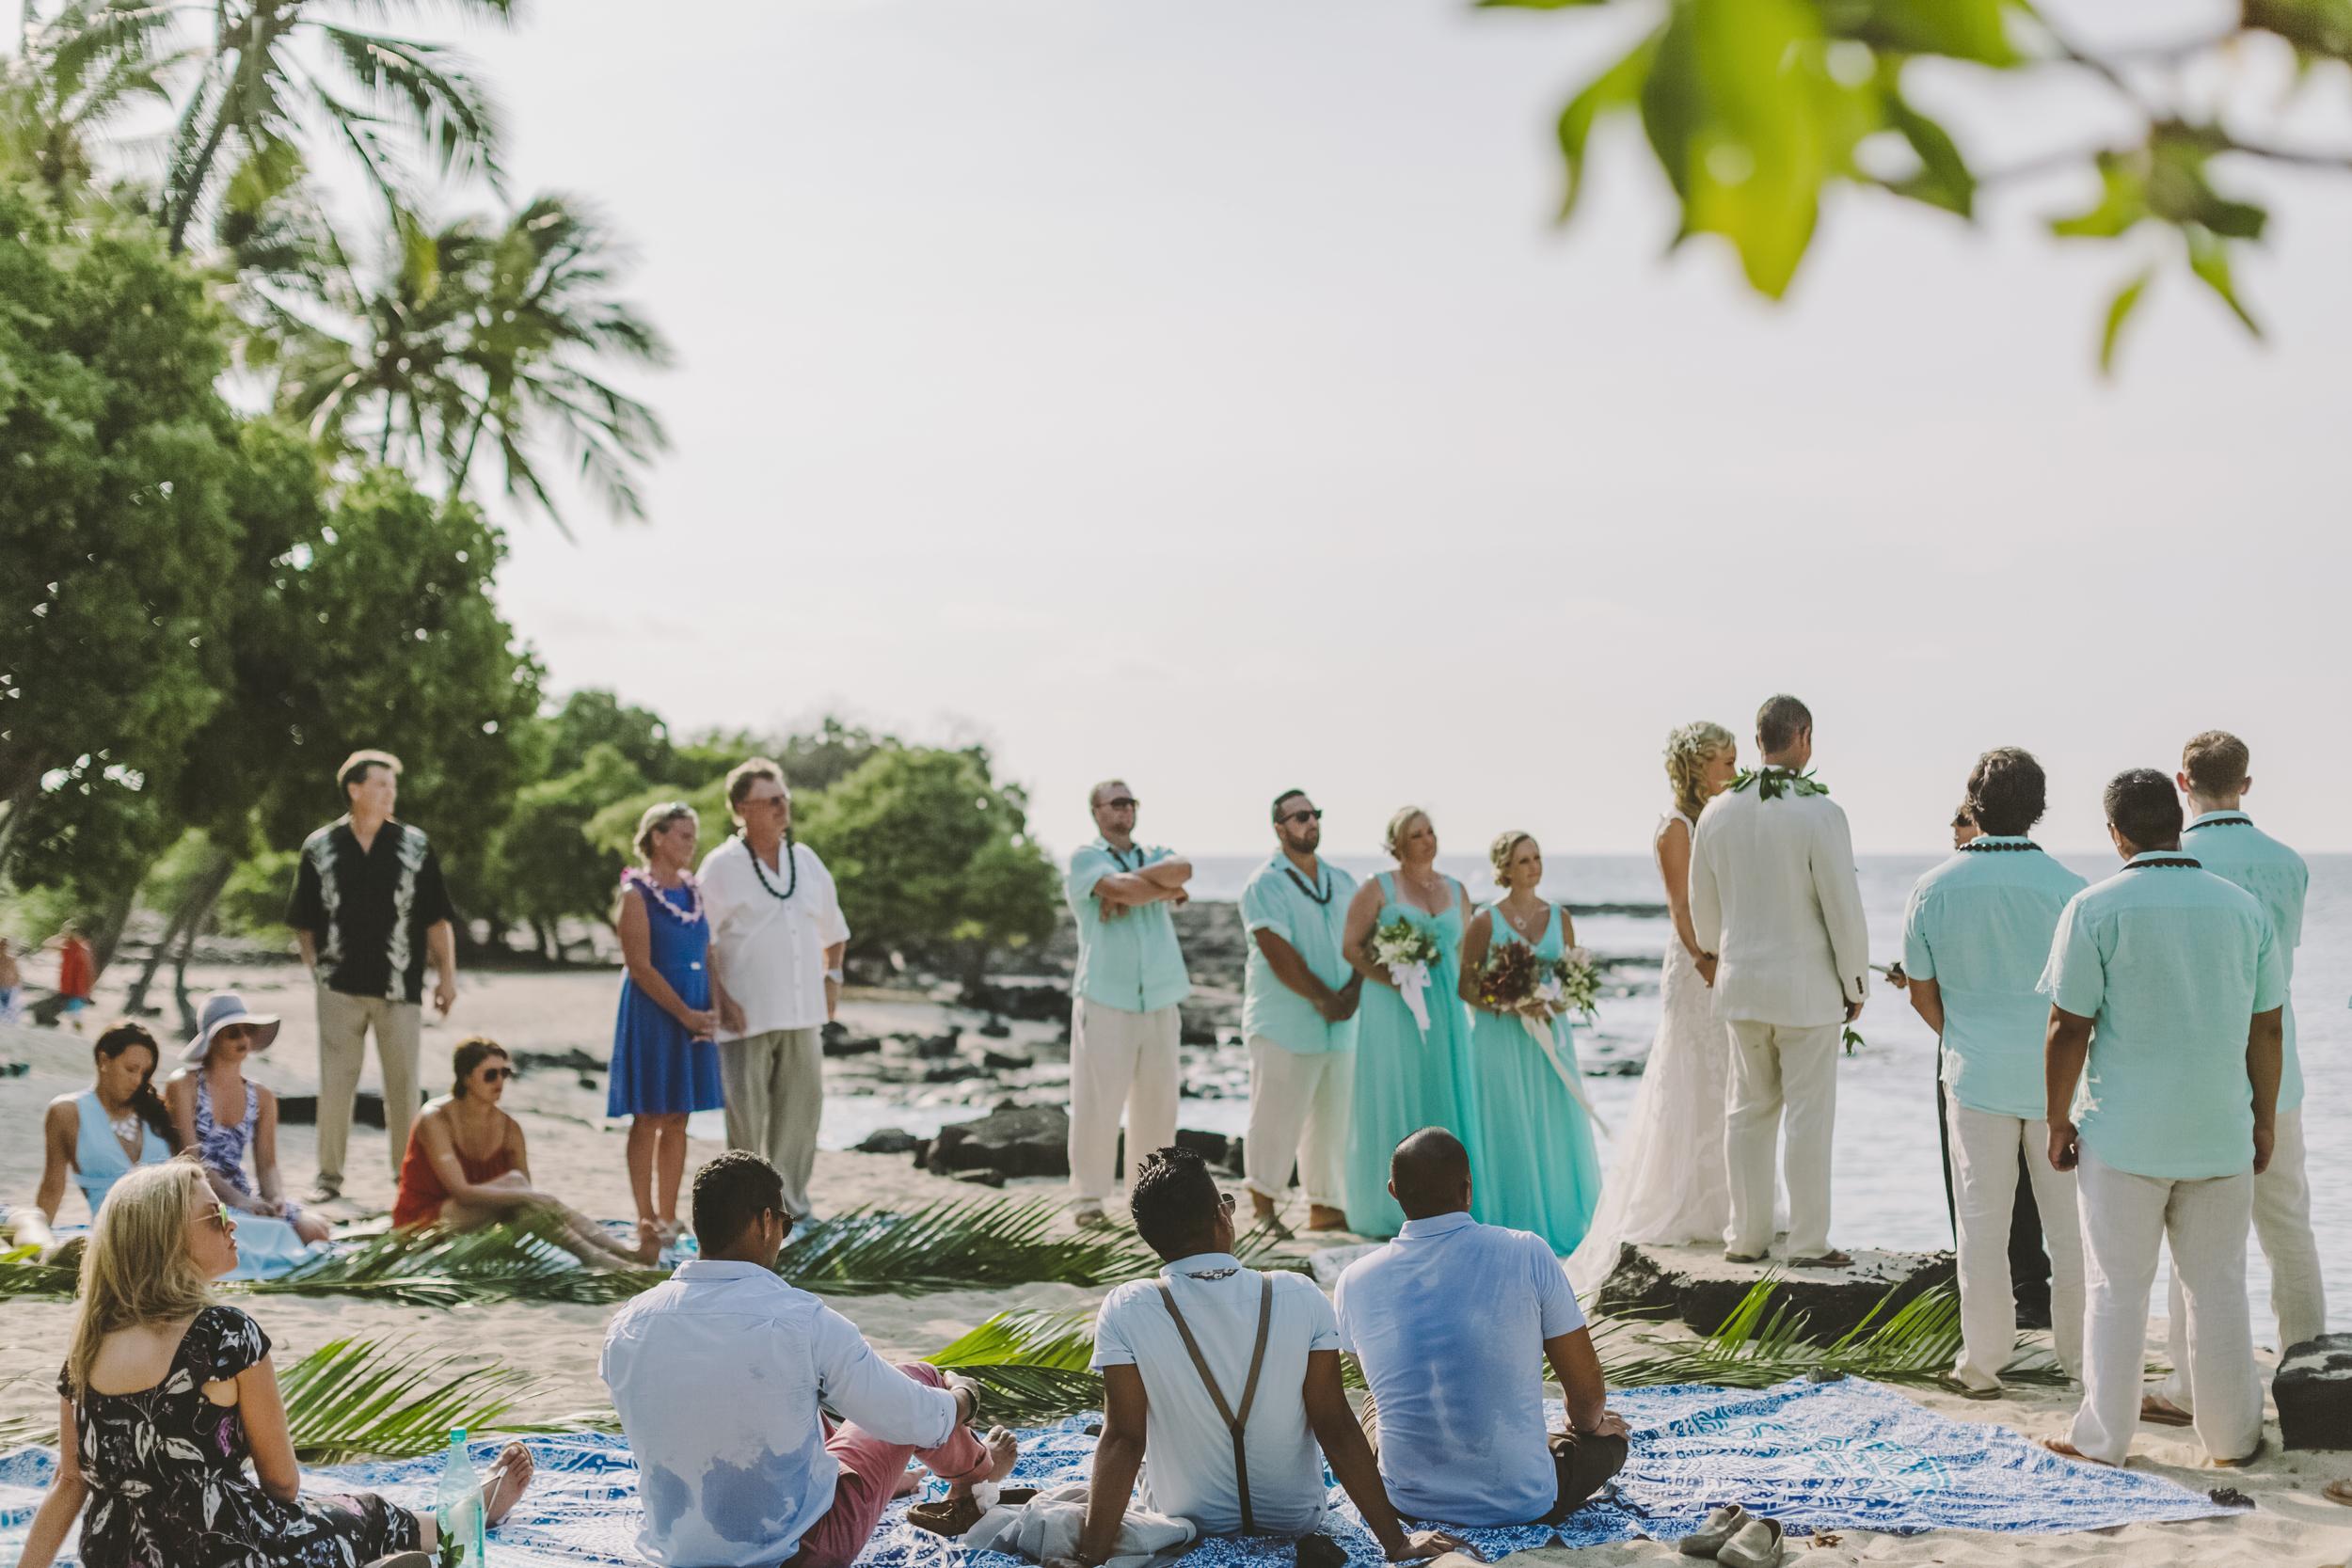 angie-diaz-photography-hawaii-wedding-photographer-kelli-jay-73.jpg